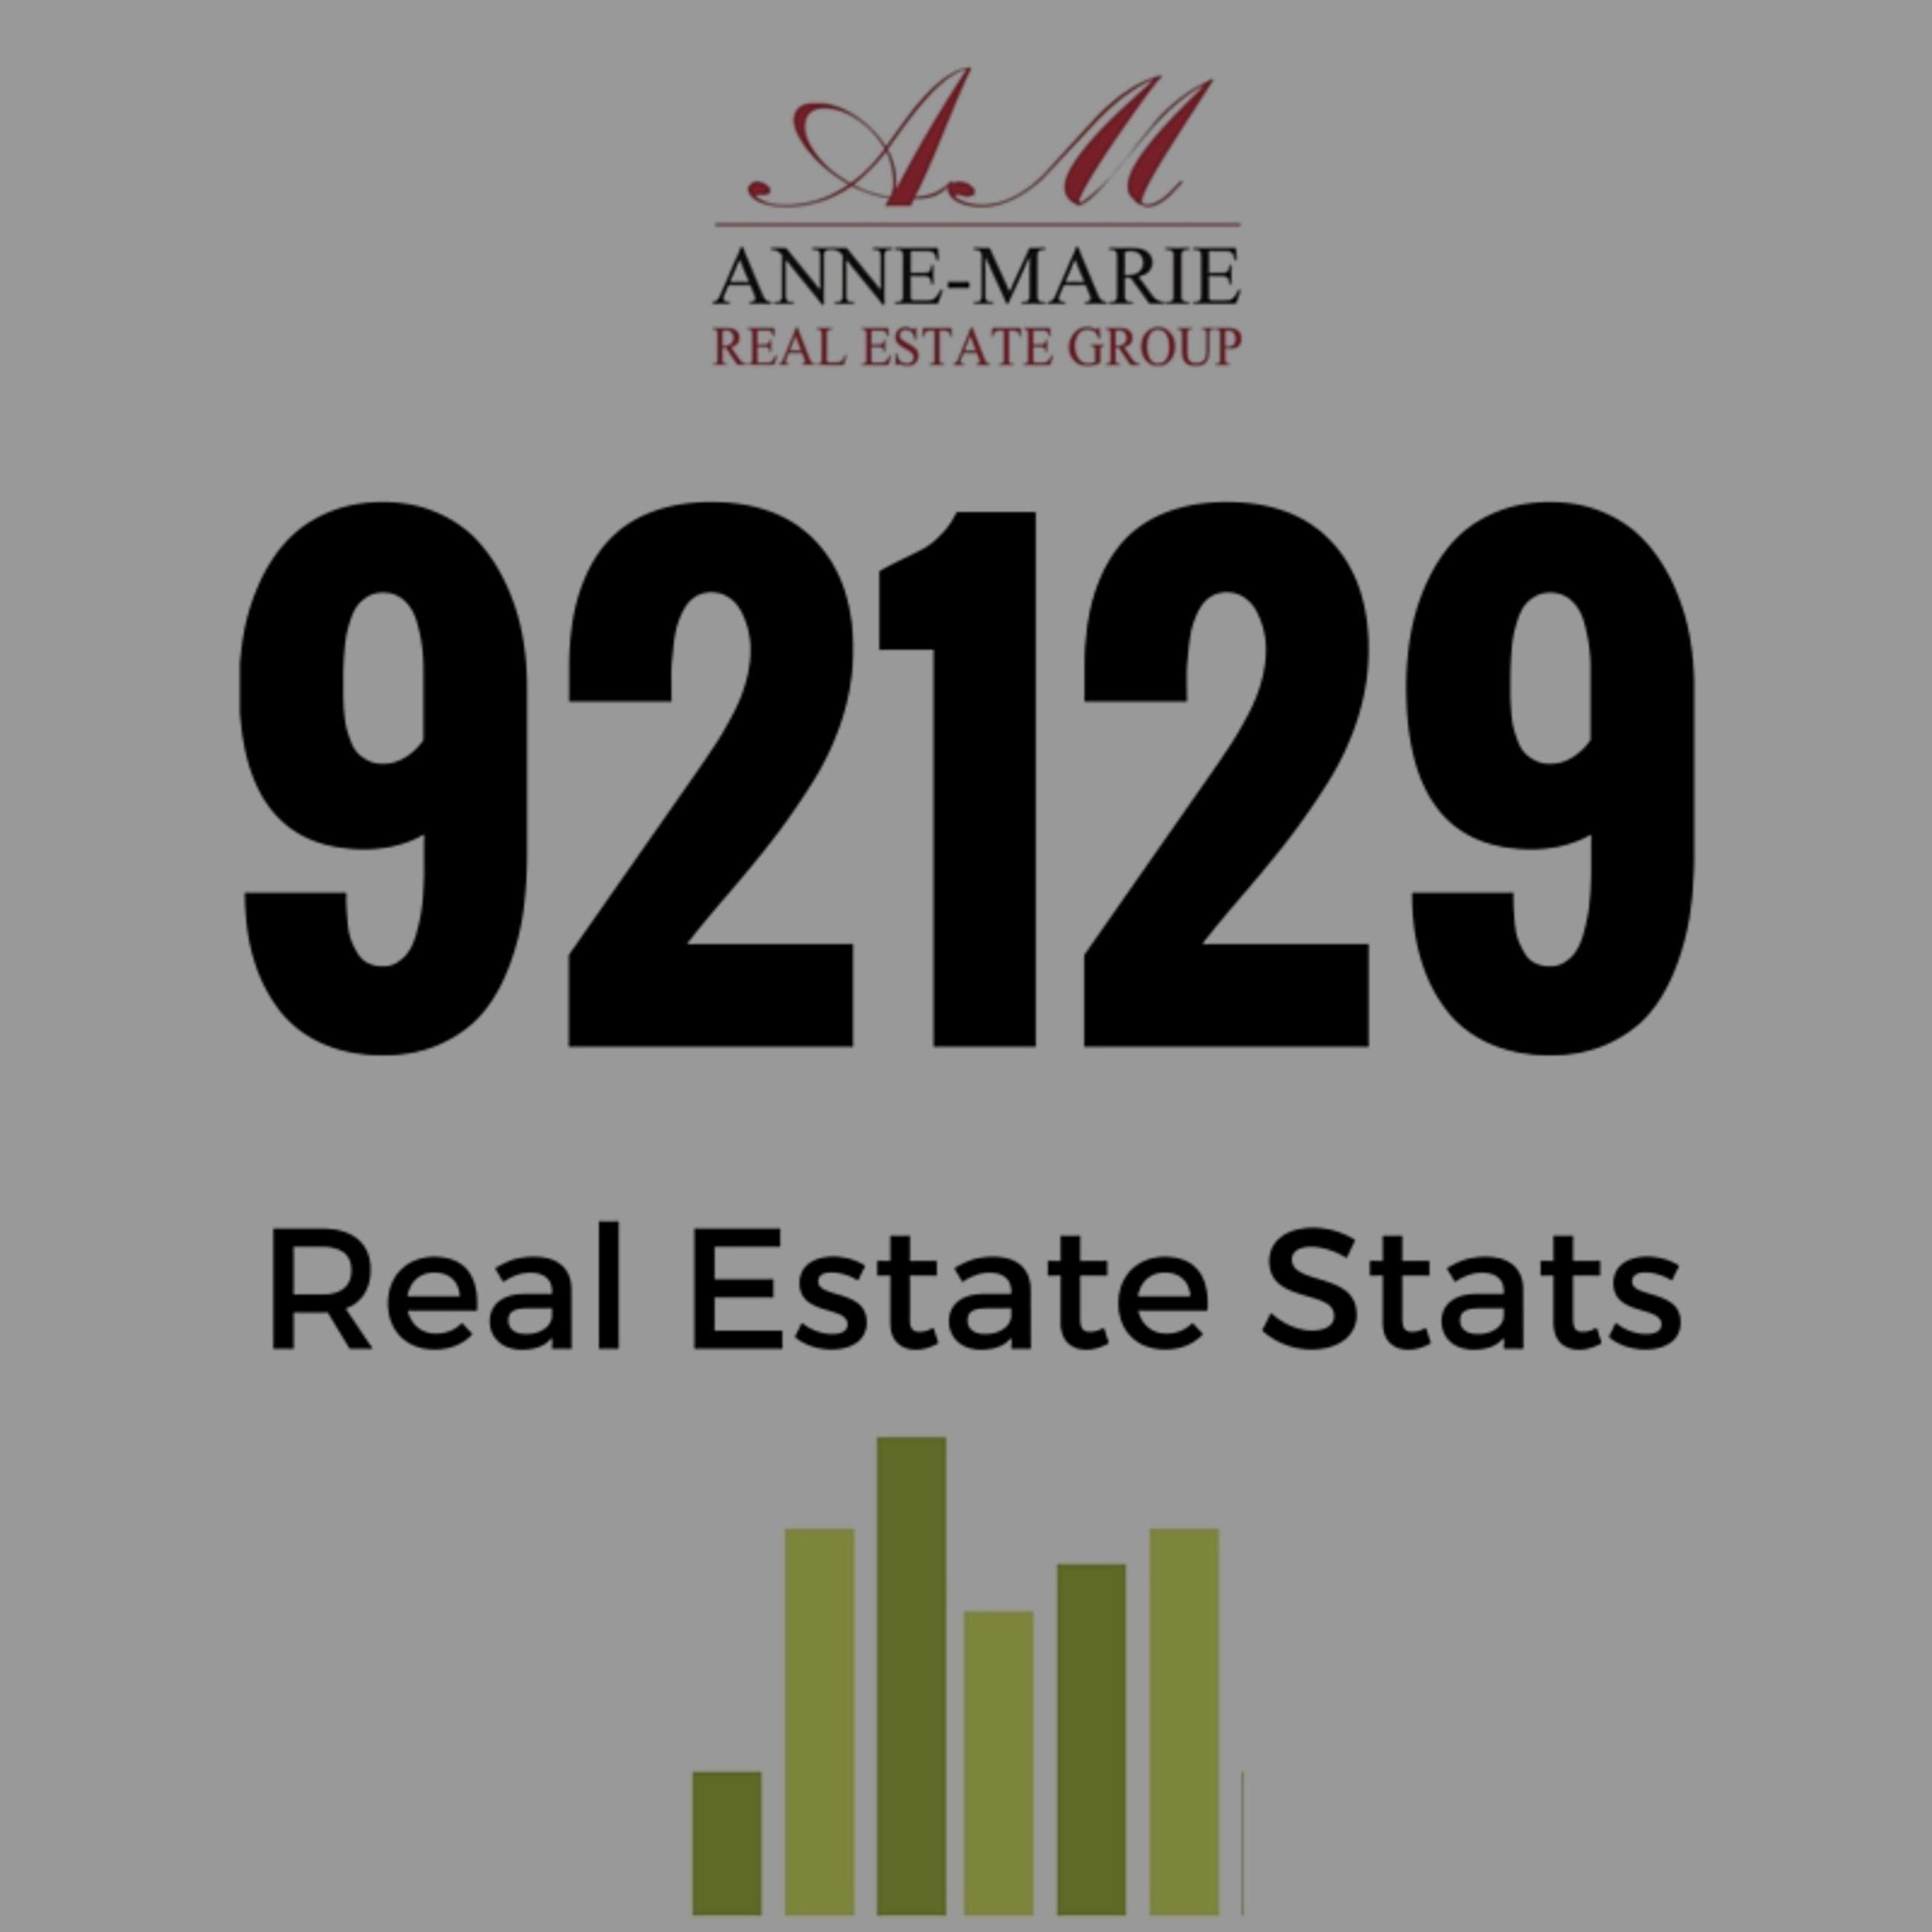 Ranch PQ 92129 Real Estate Update | April 2016